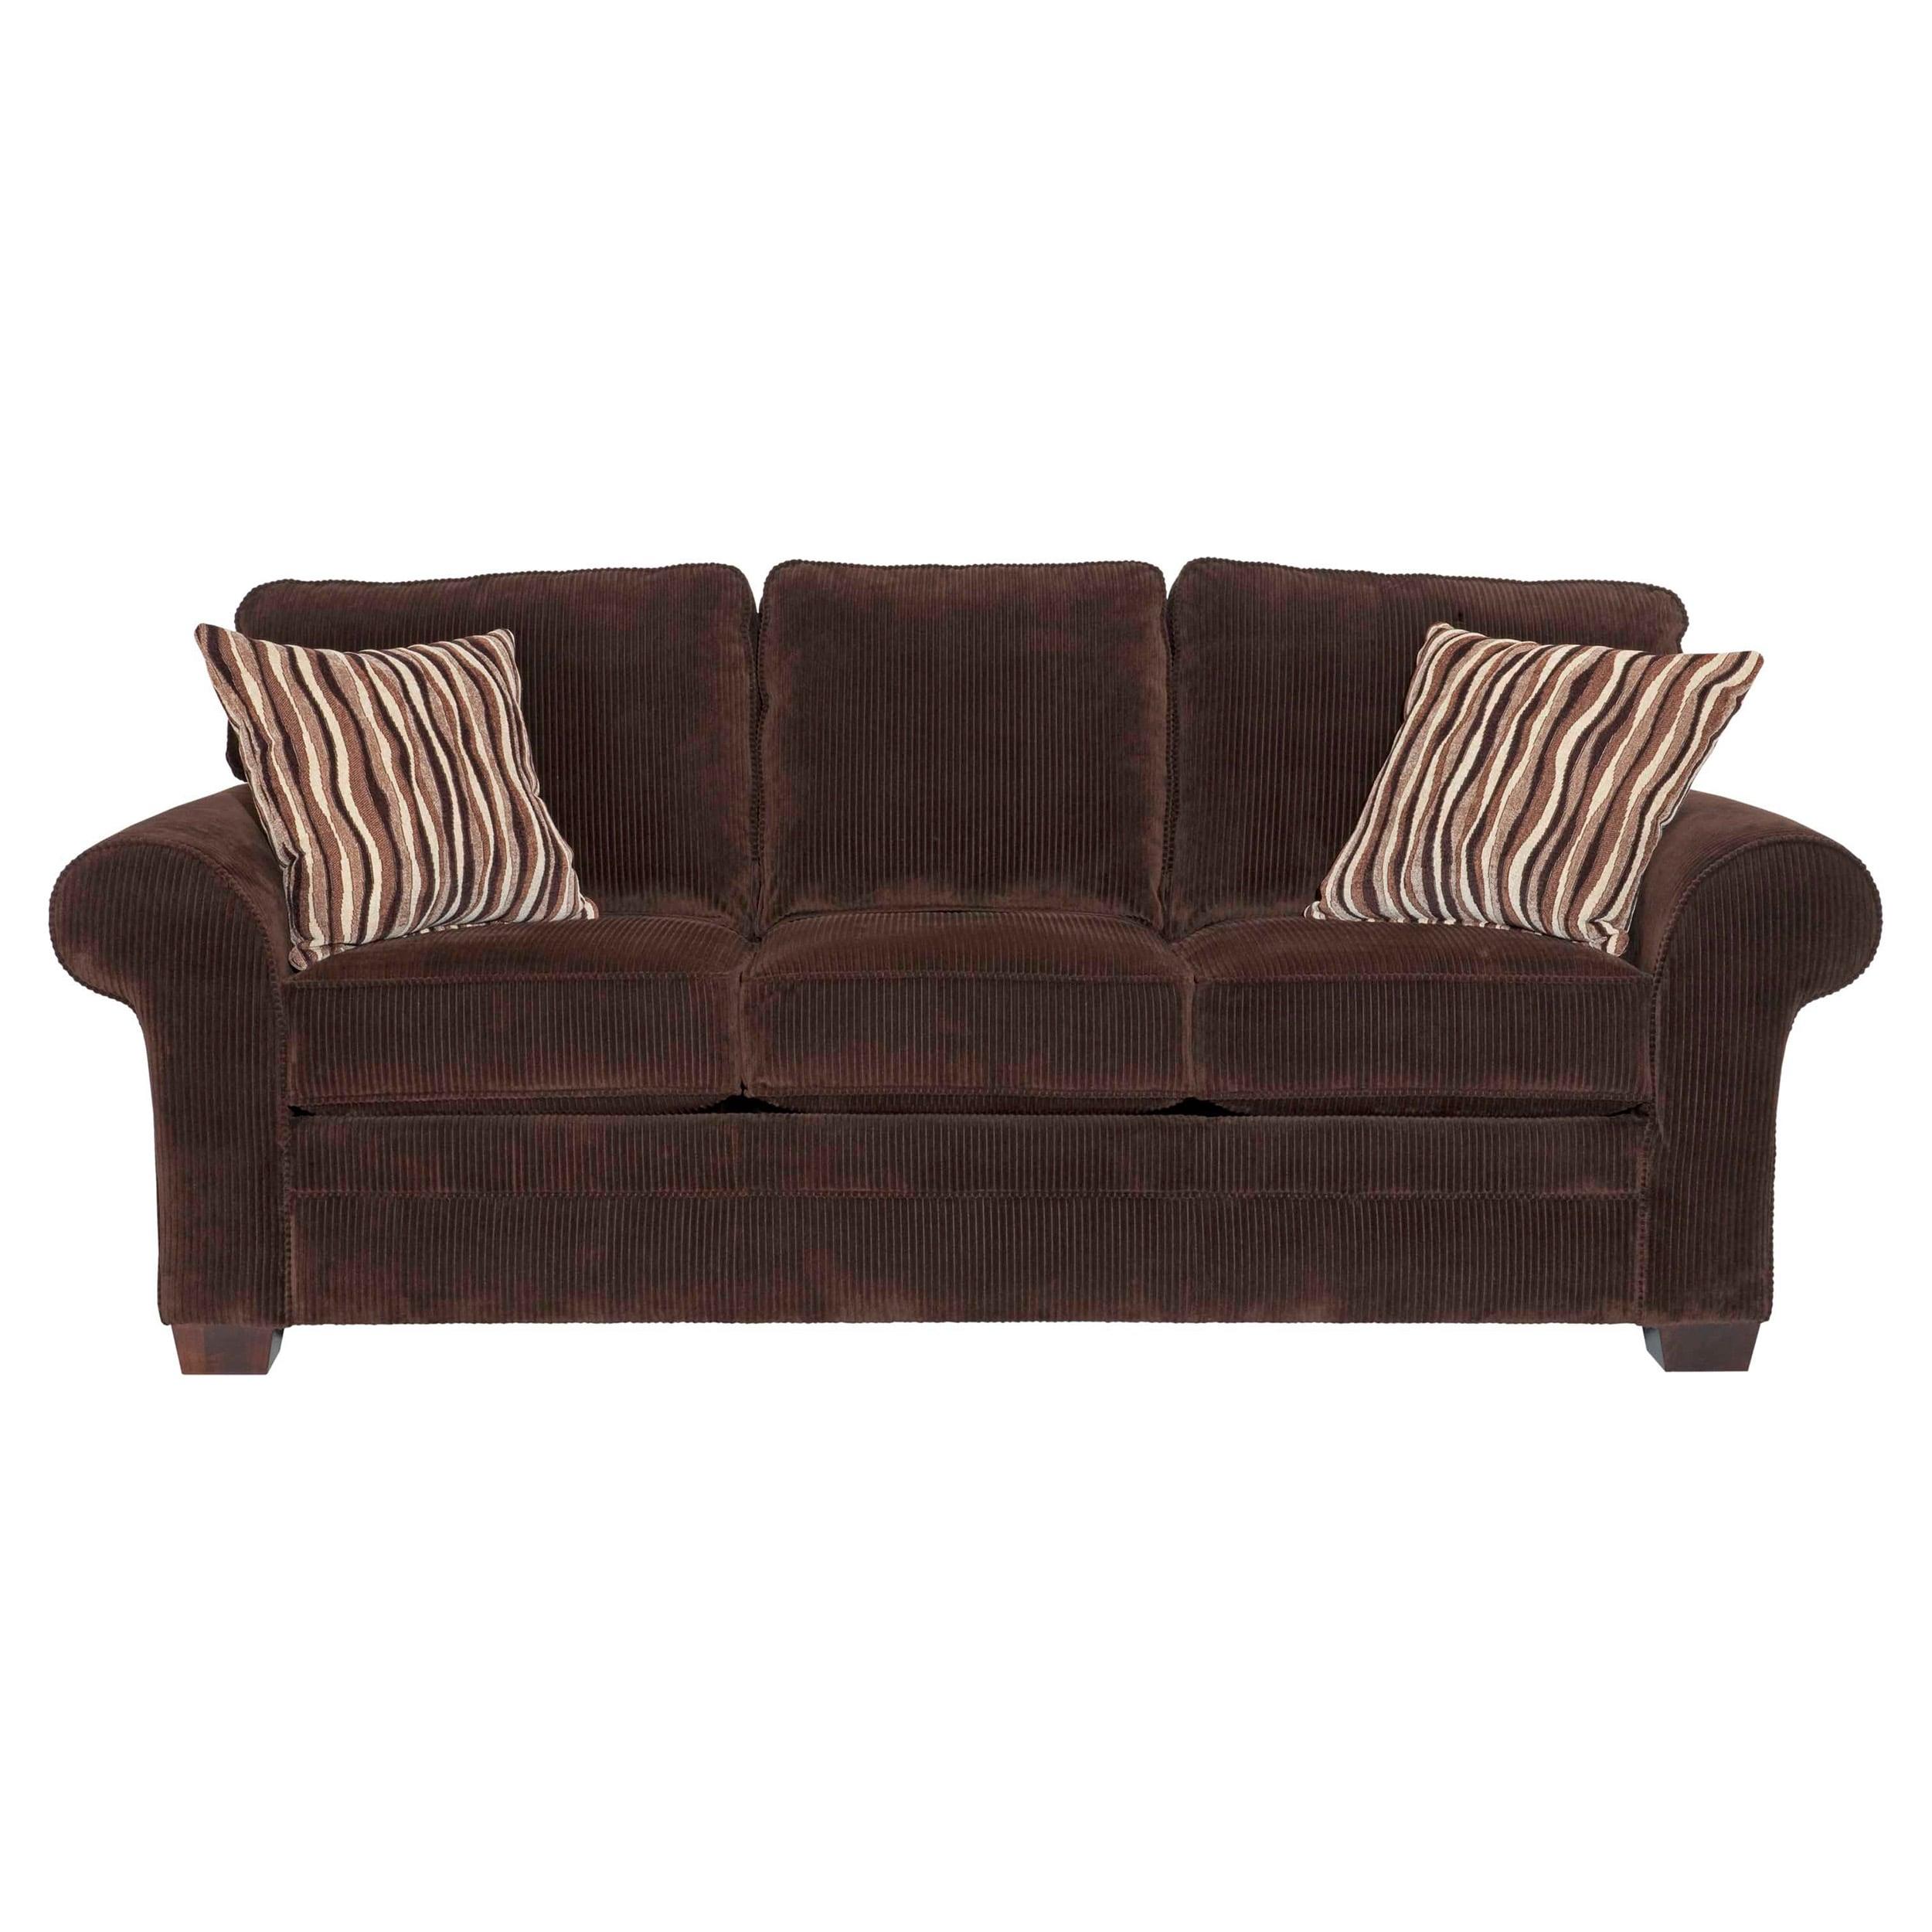 Broyhill Zoey Dark Chocolate Queen Sofa Sleeper 14292593